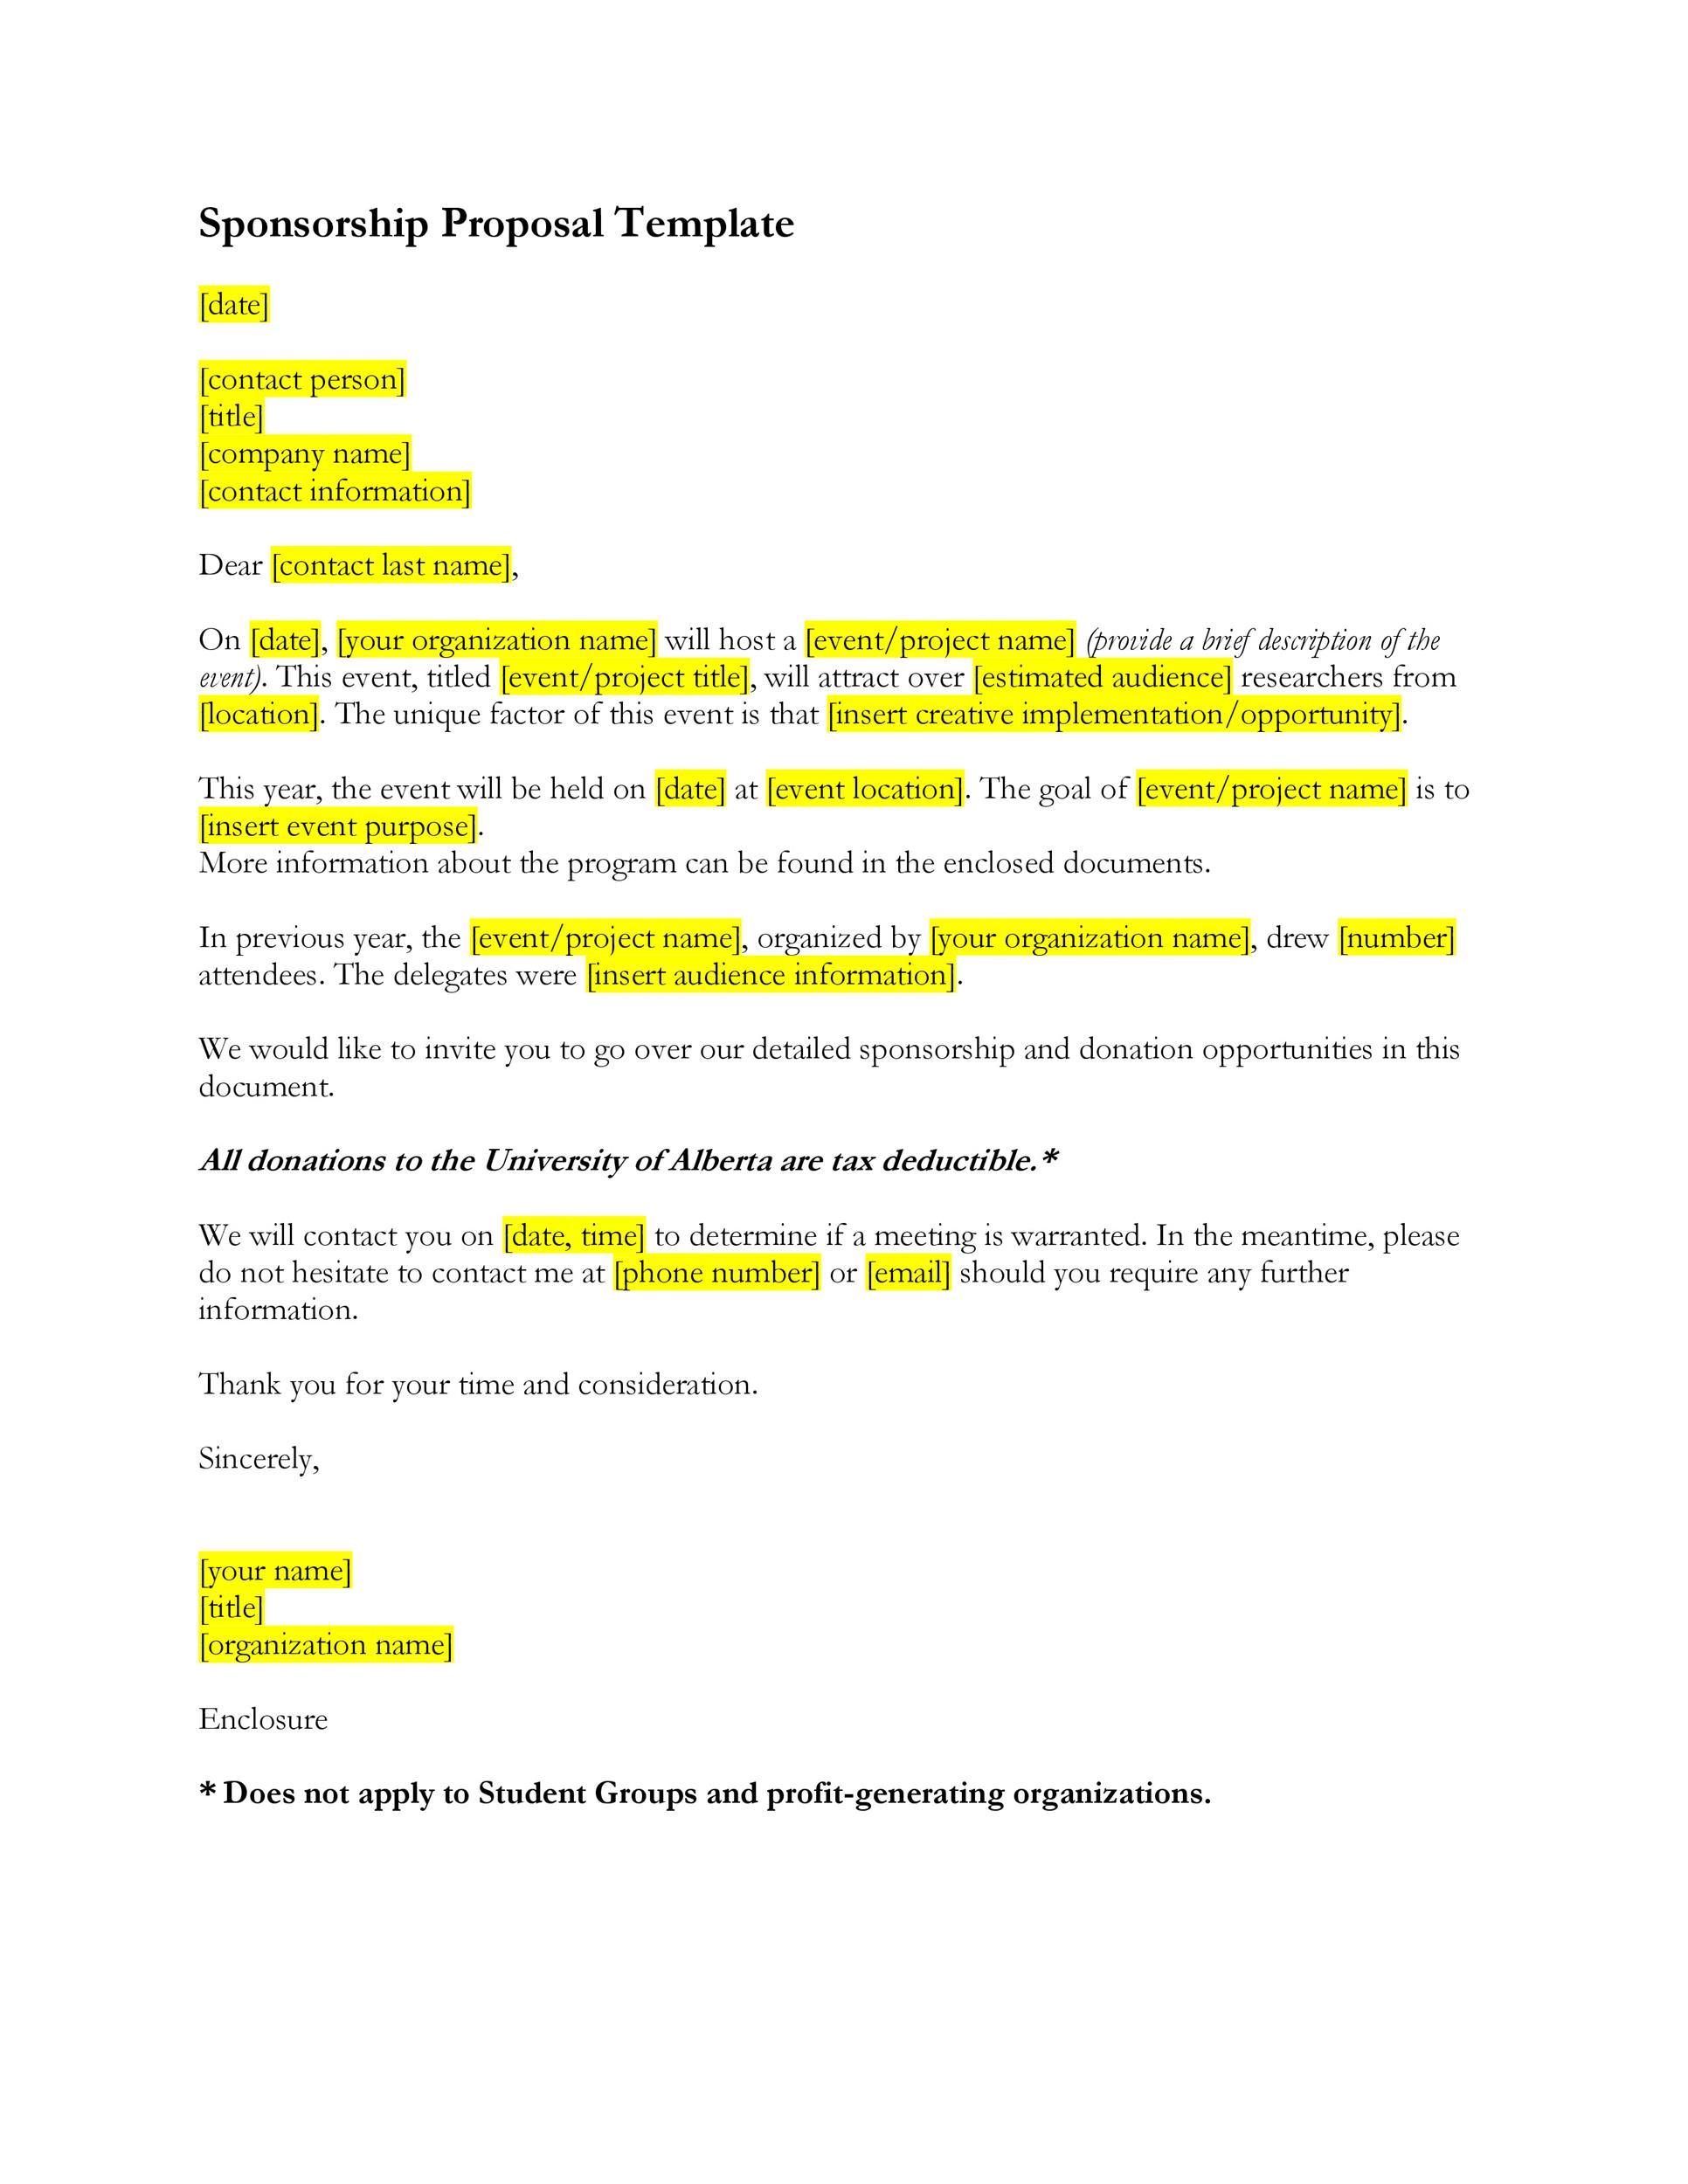 Free Sponsorship Letter Template 43